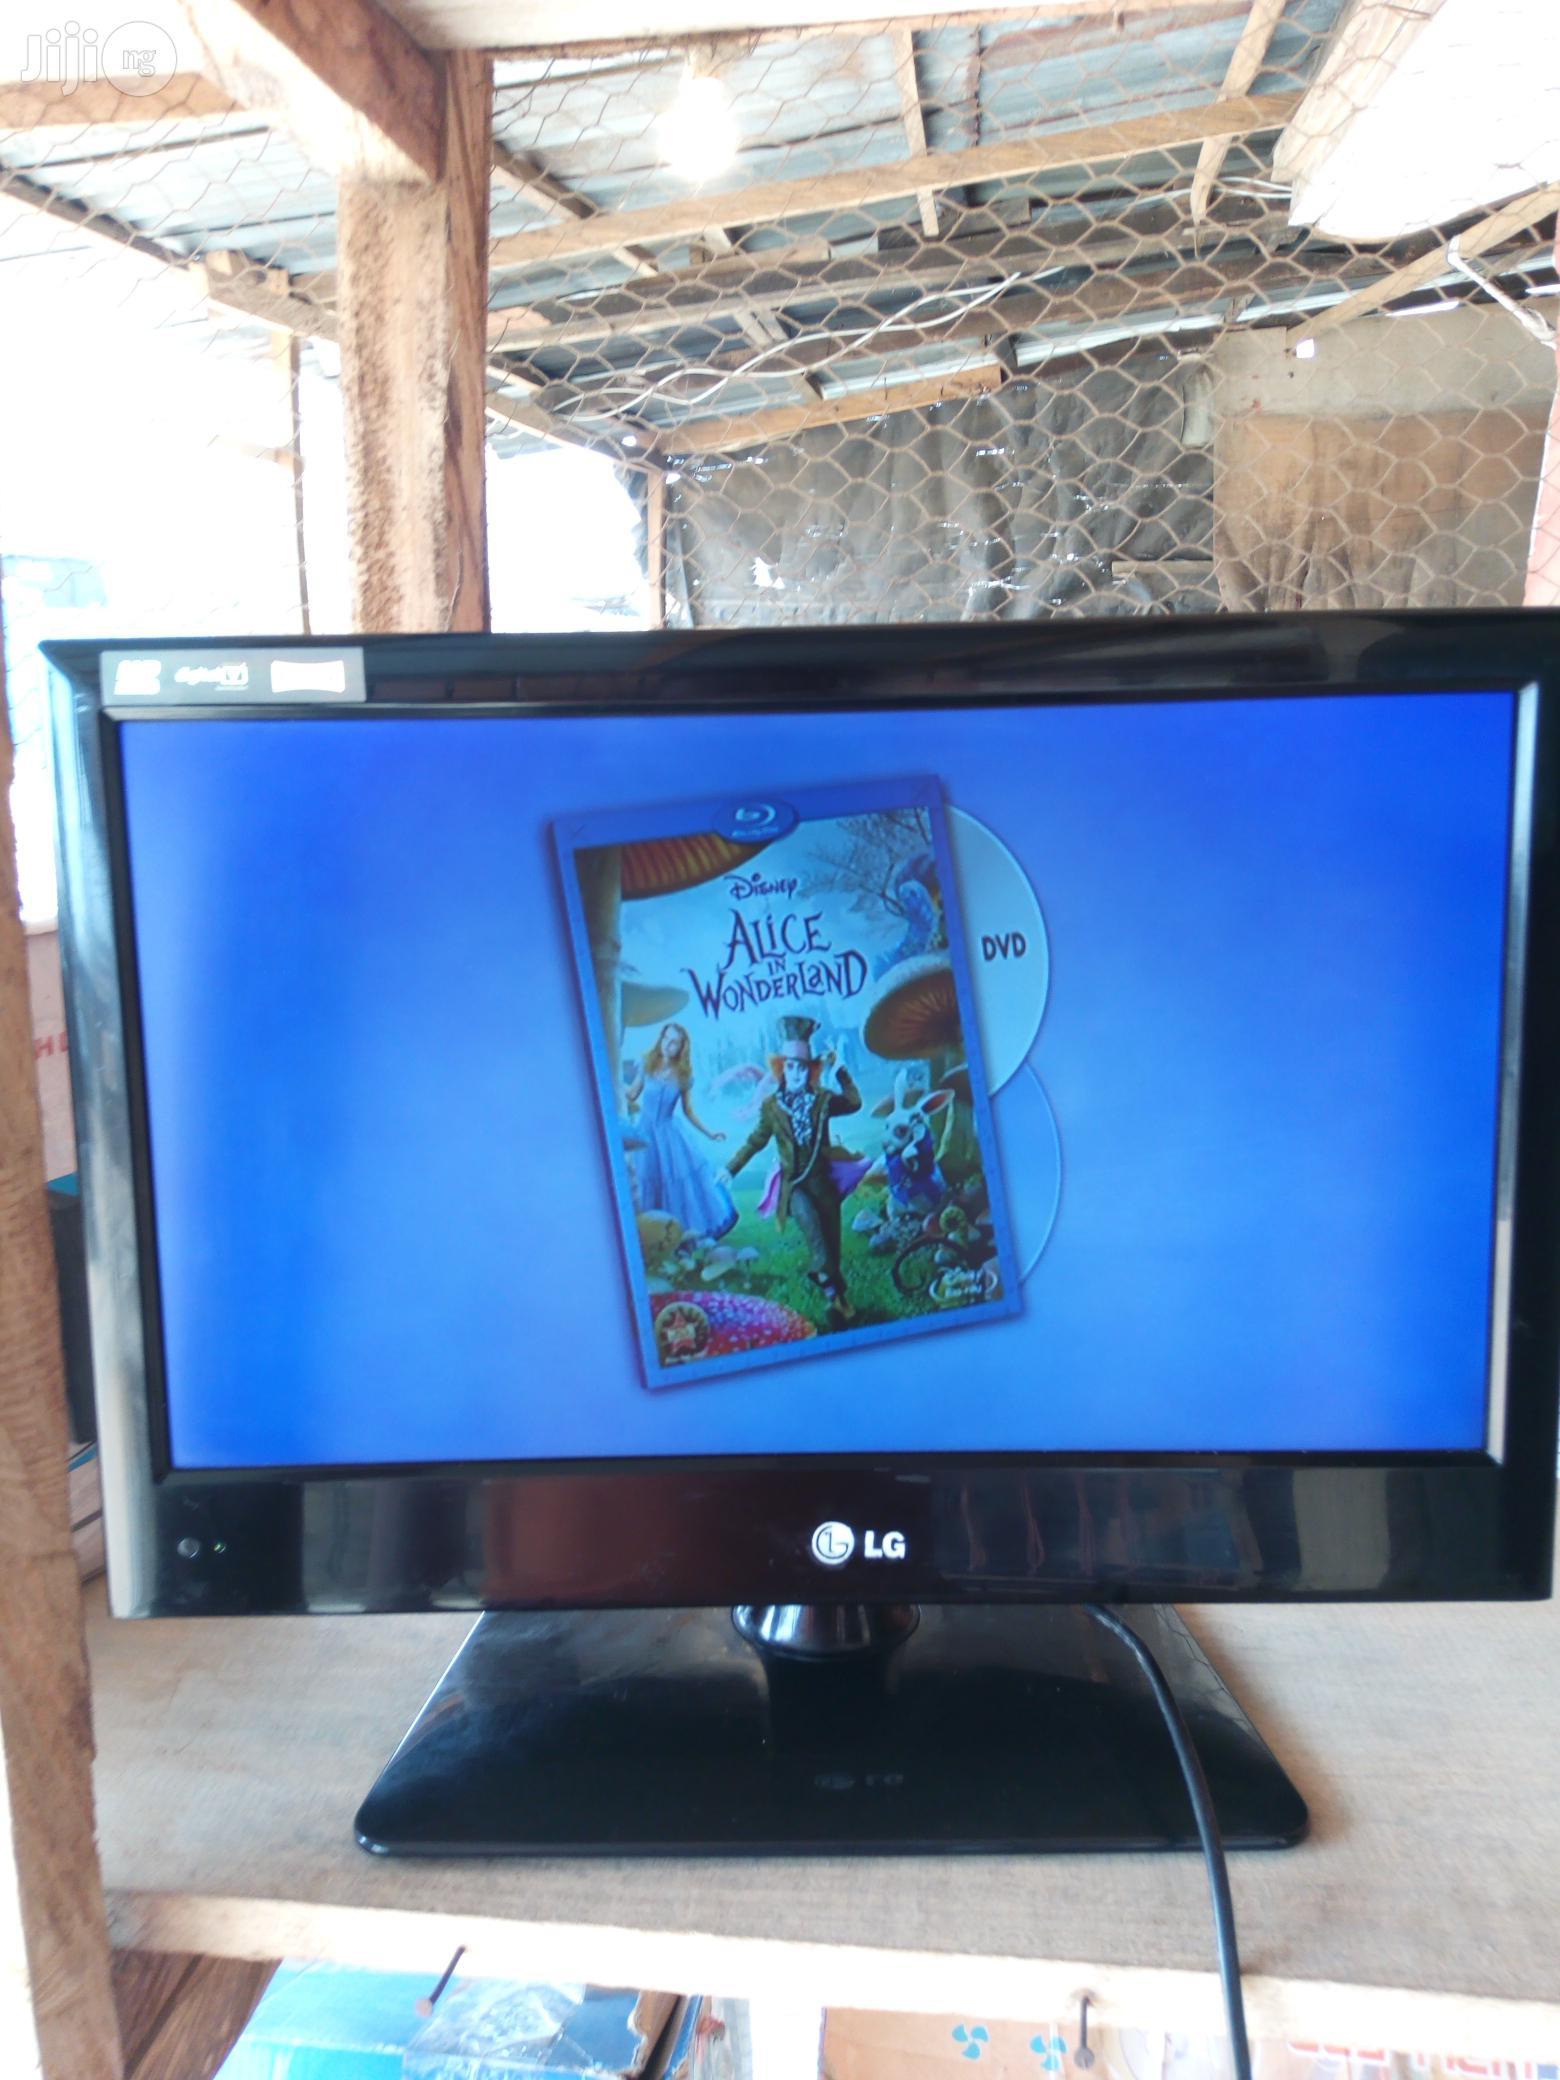 LG LED HD Plasma TV 19inchs